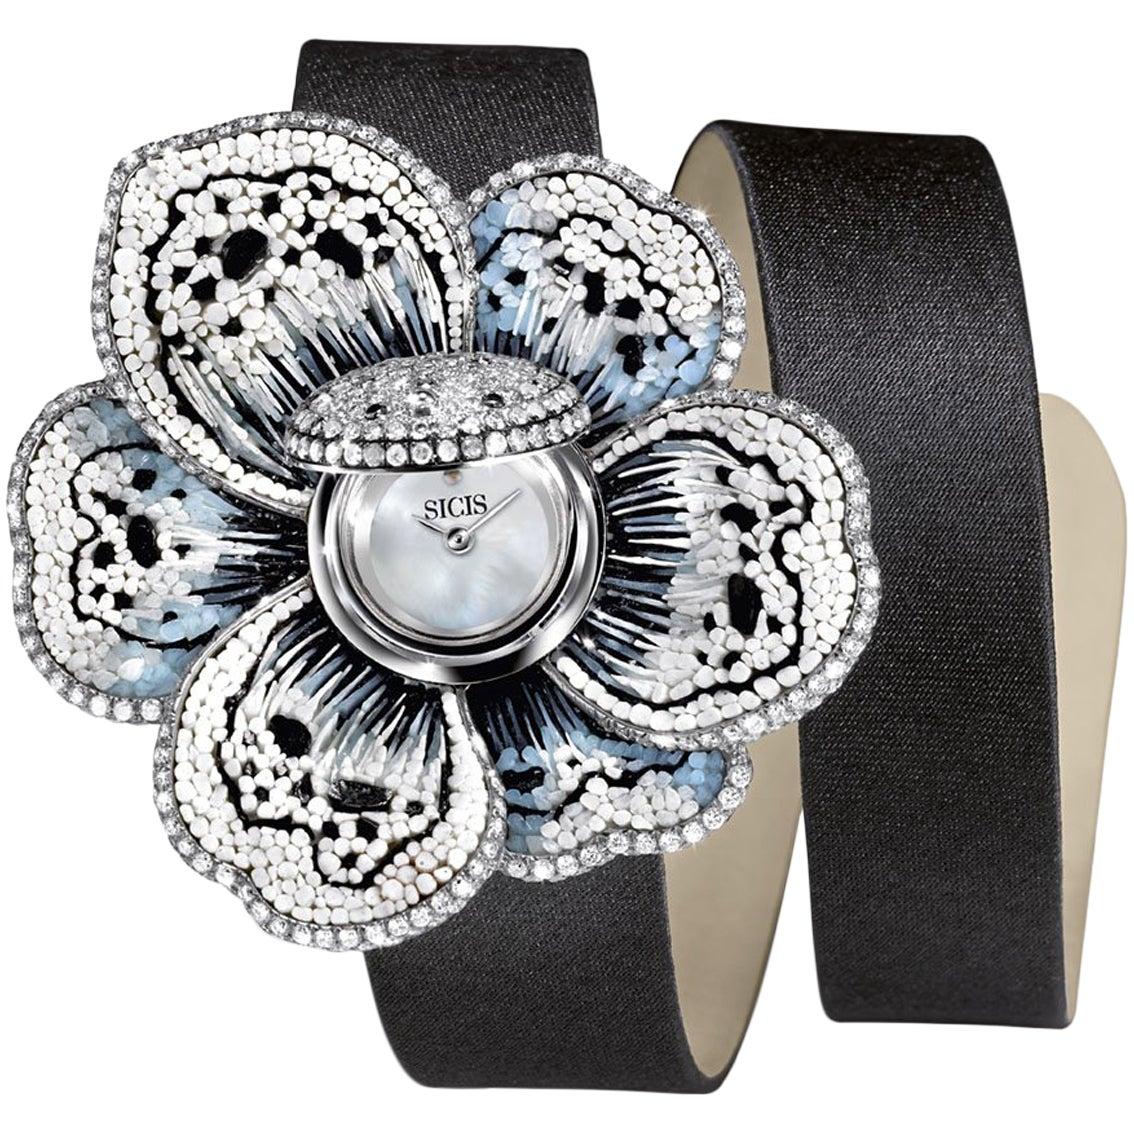 Stylish Wristwatch White & Black Diamond White Gold Quartz Movement